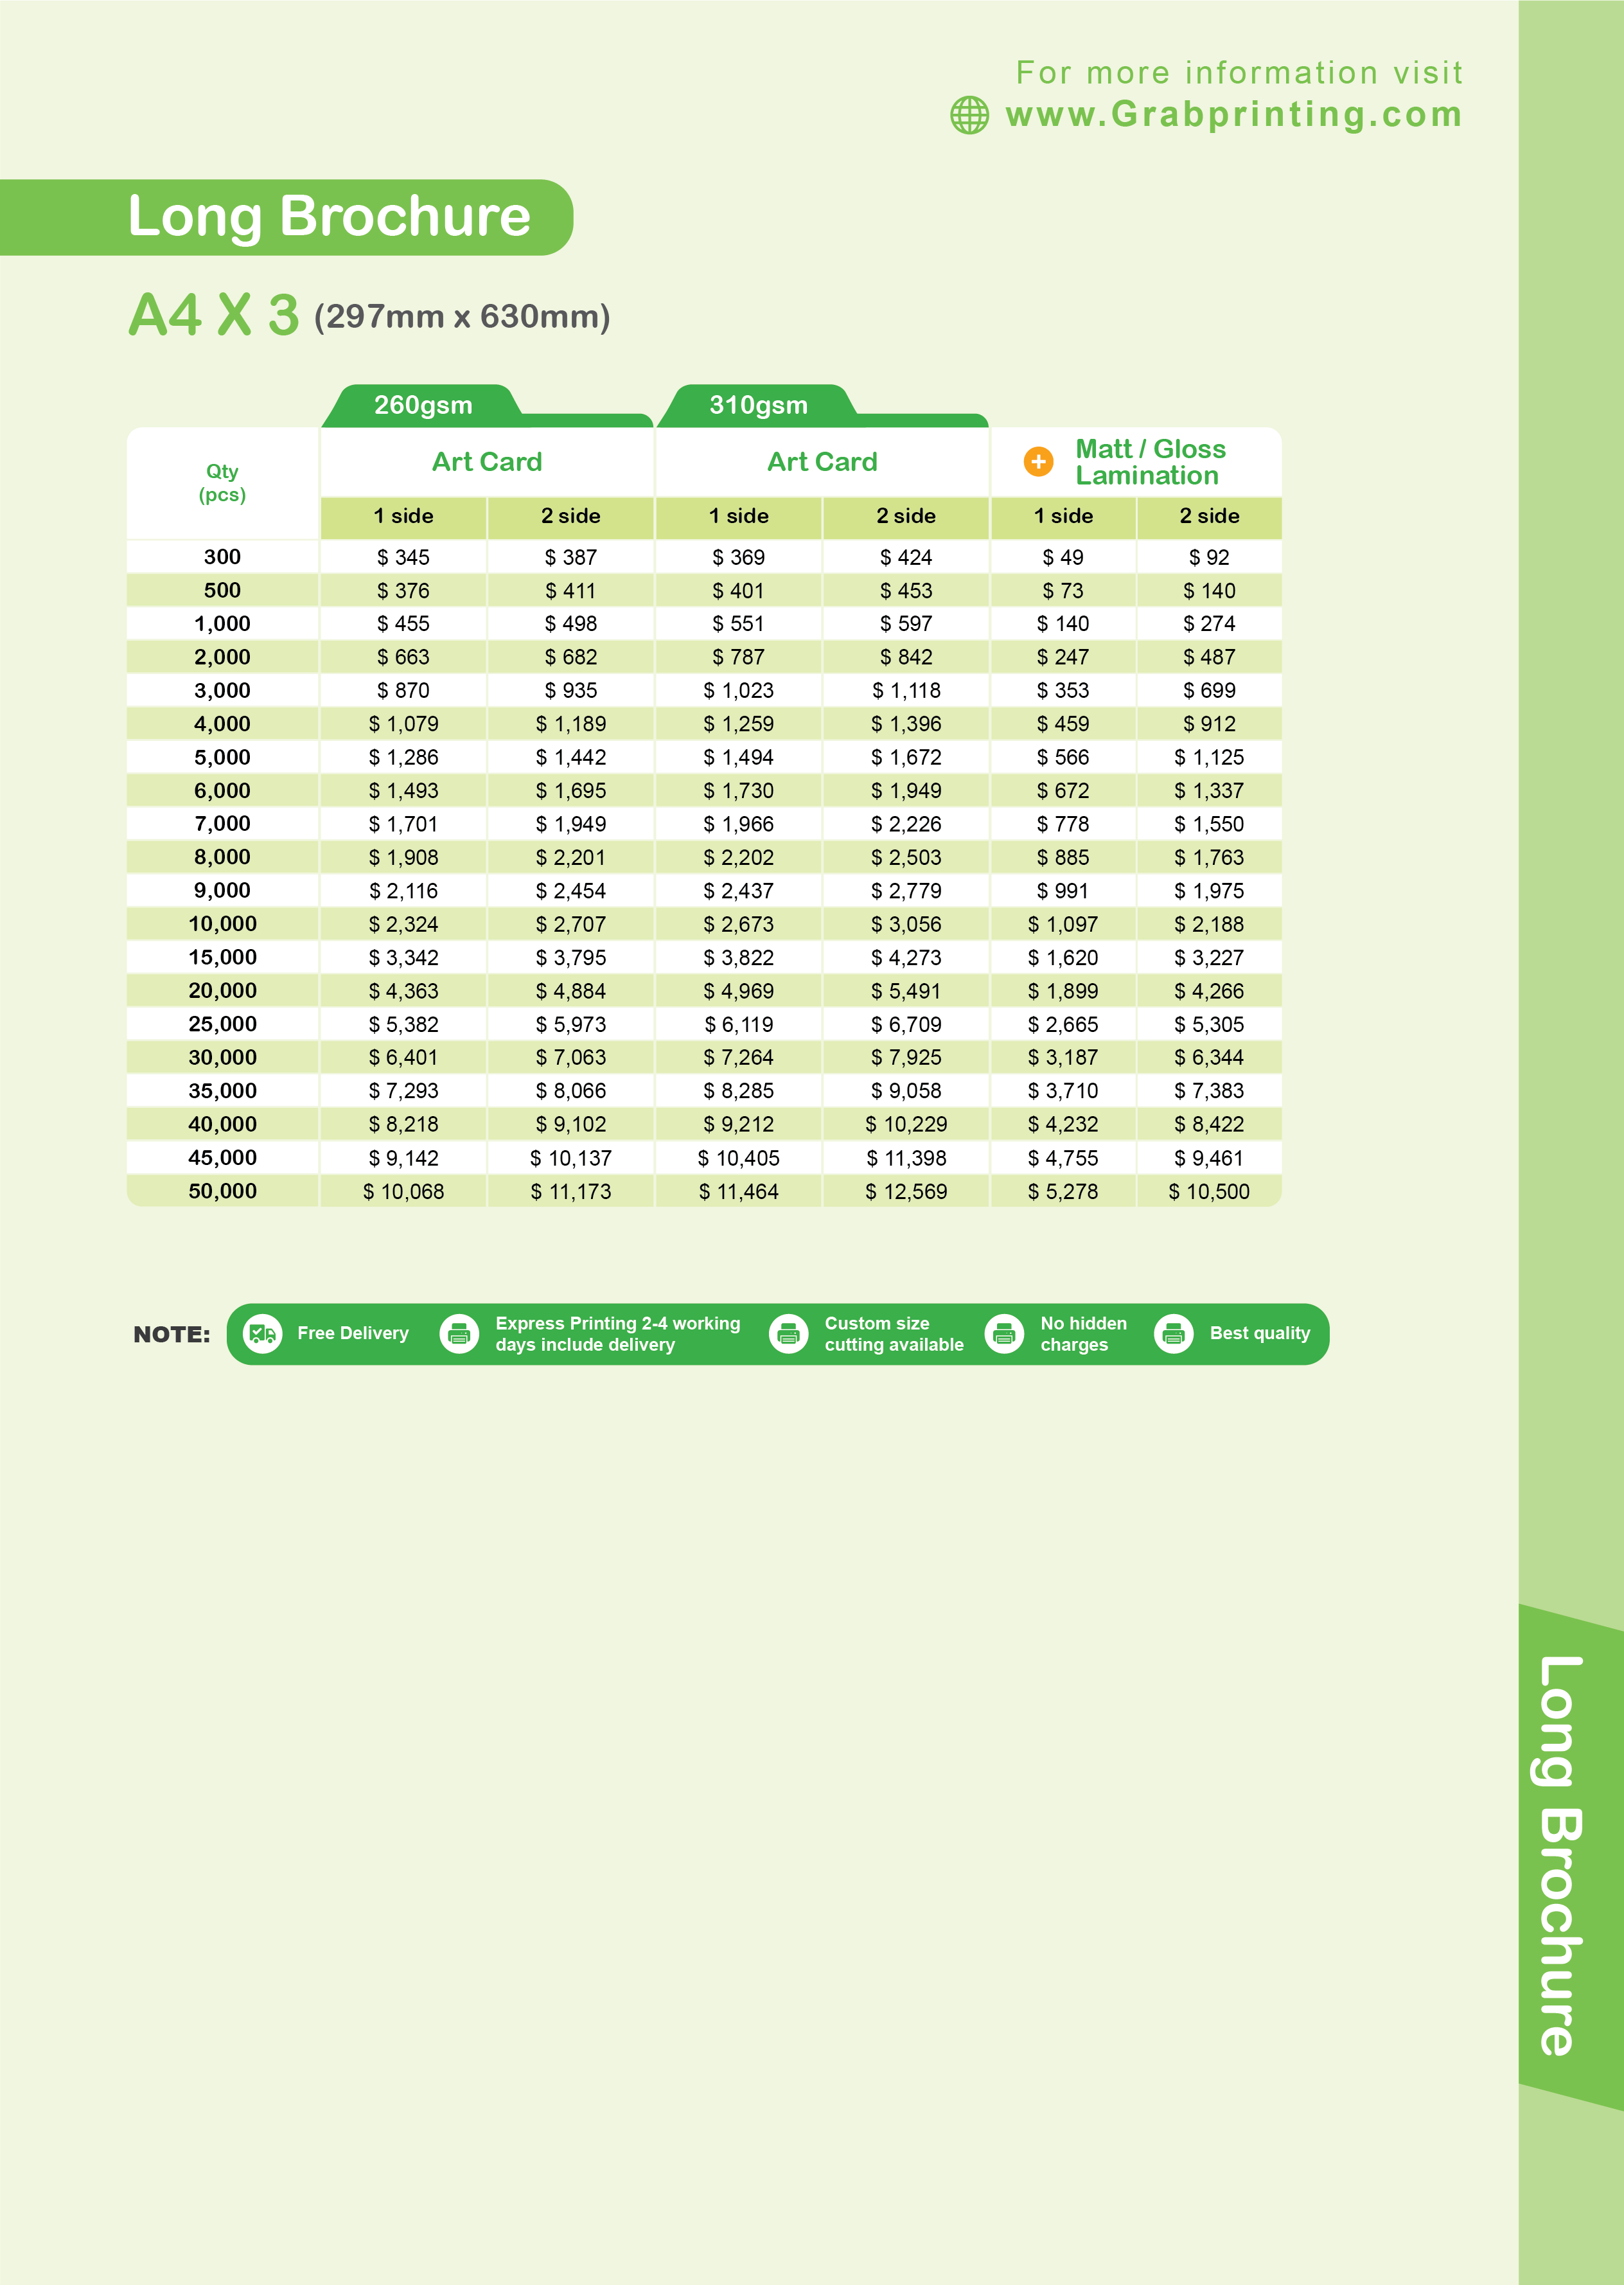 brochure printing Brochure Printing Long Brochure A4 x 3 Card Price List